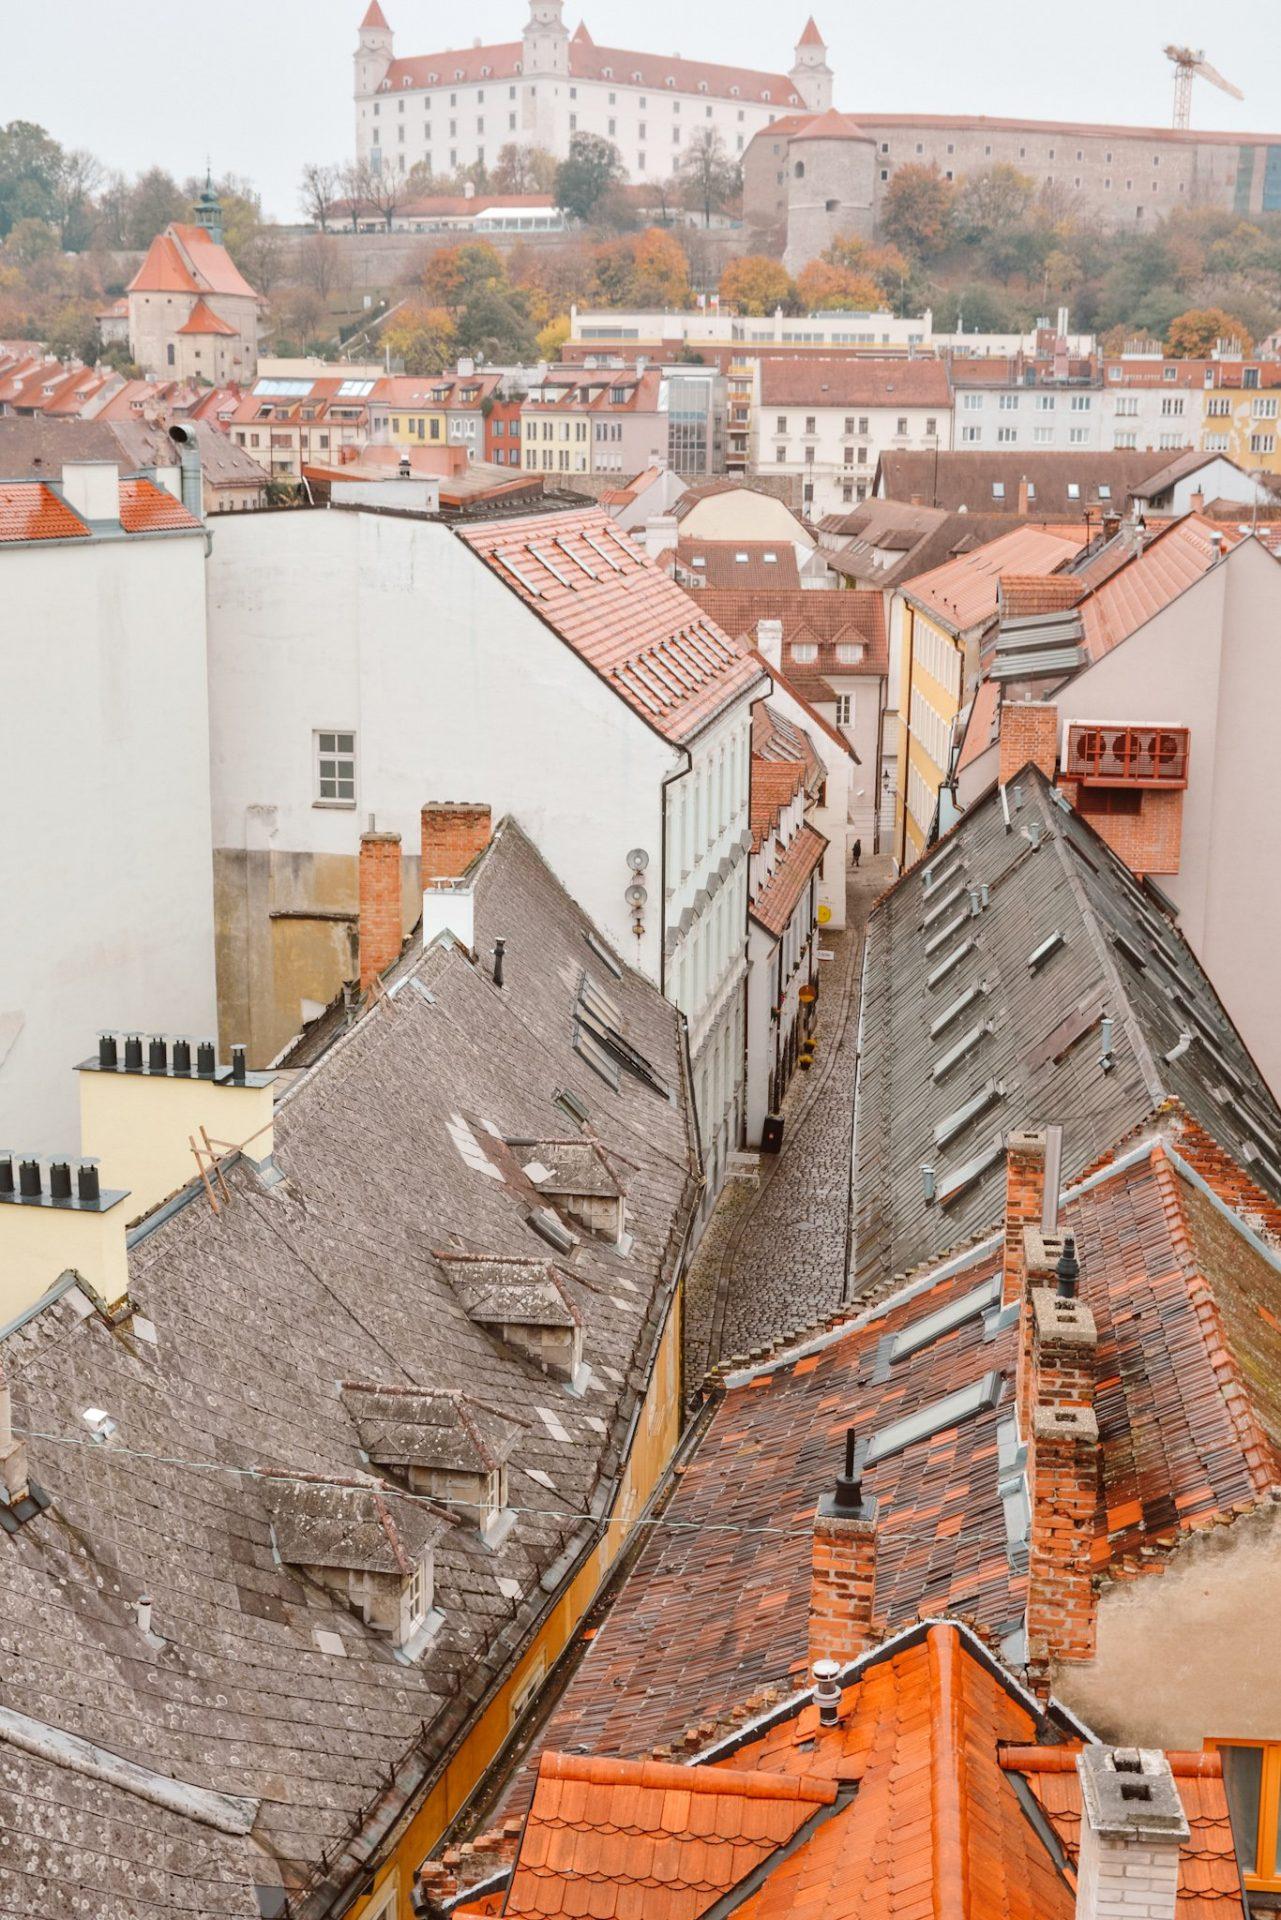 Travel Guide to Bratislava, Slovakia